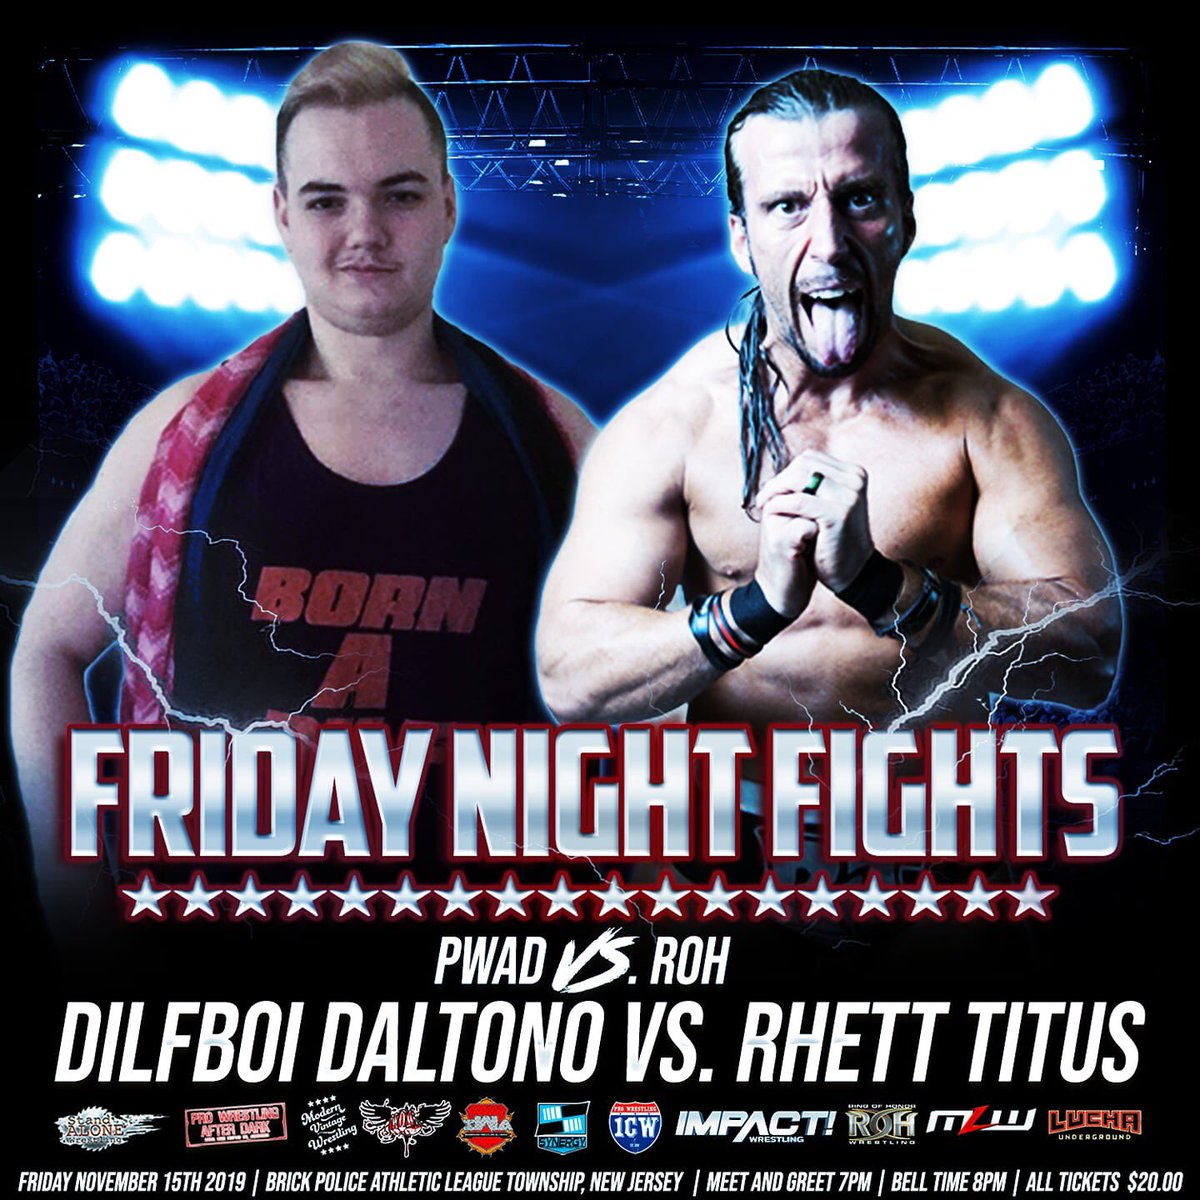 Watch my match against Rhett Titus https://youtu.be/3YfwSh50DN4 #ProWrestling #DilfLife pic.twitter.com/Hf67F1Hk2q